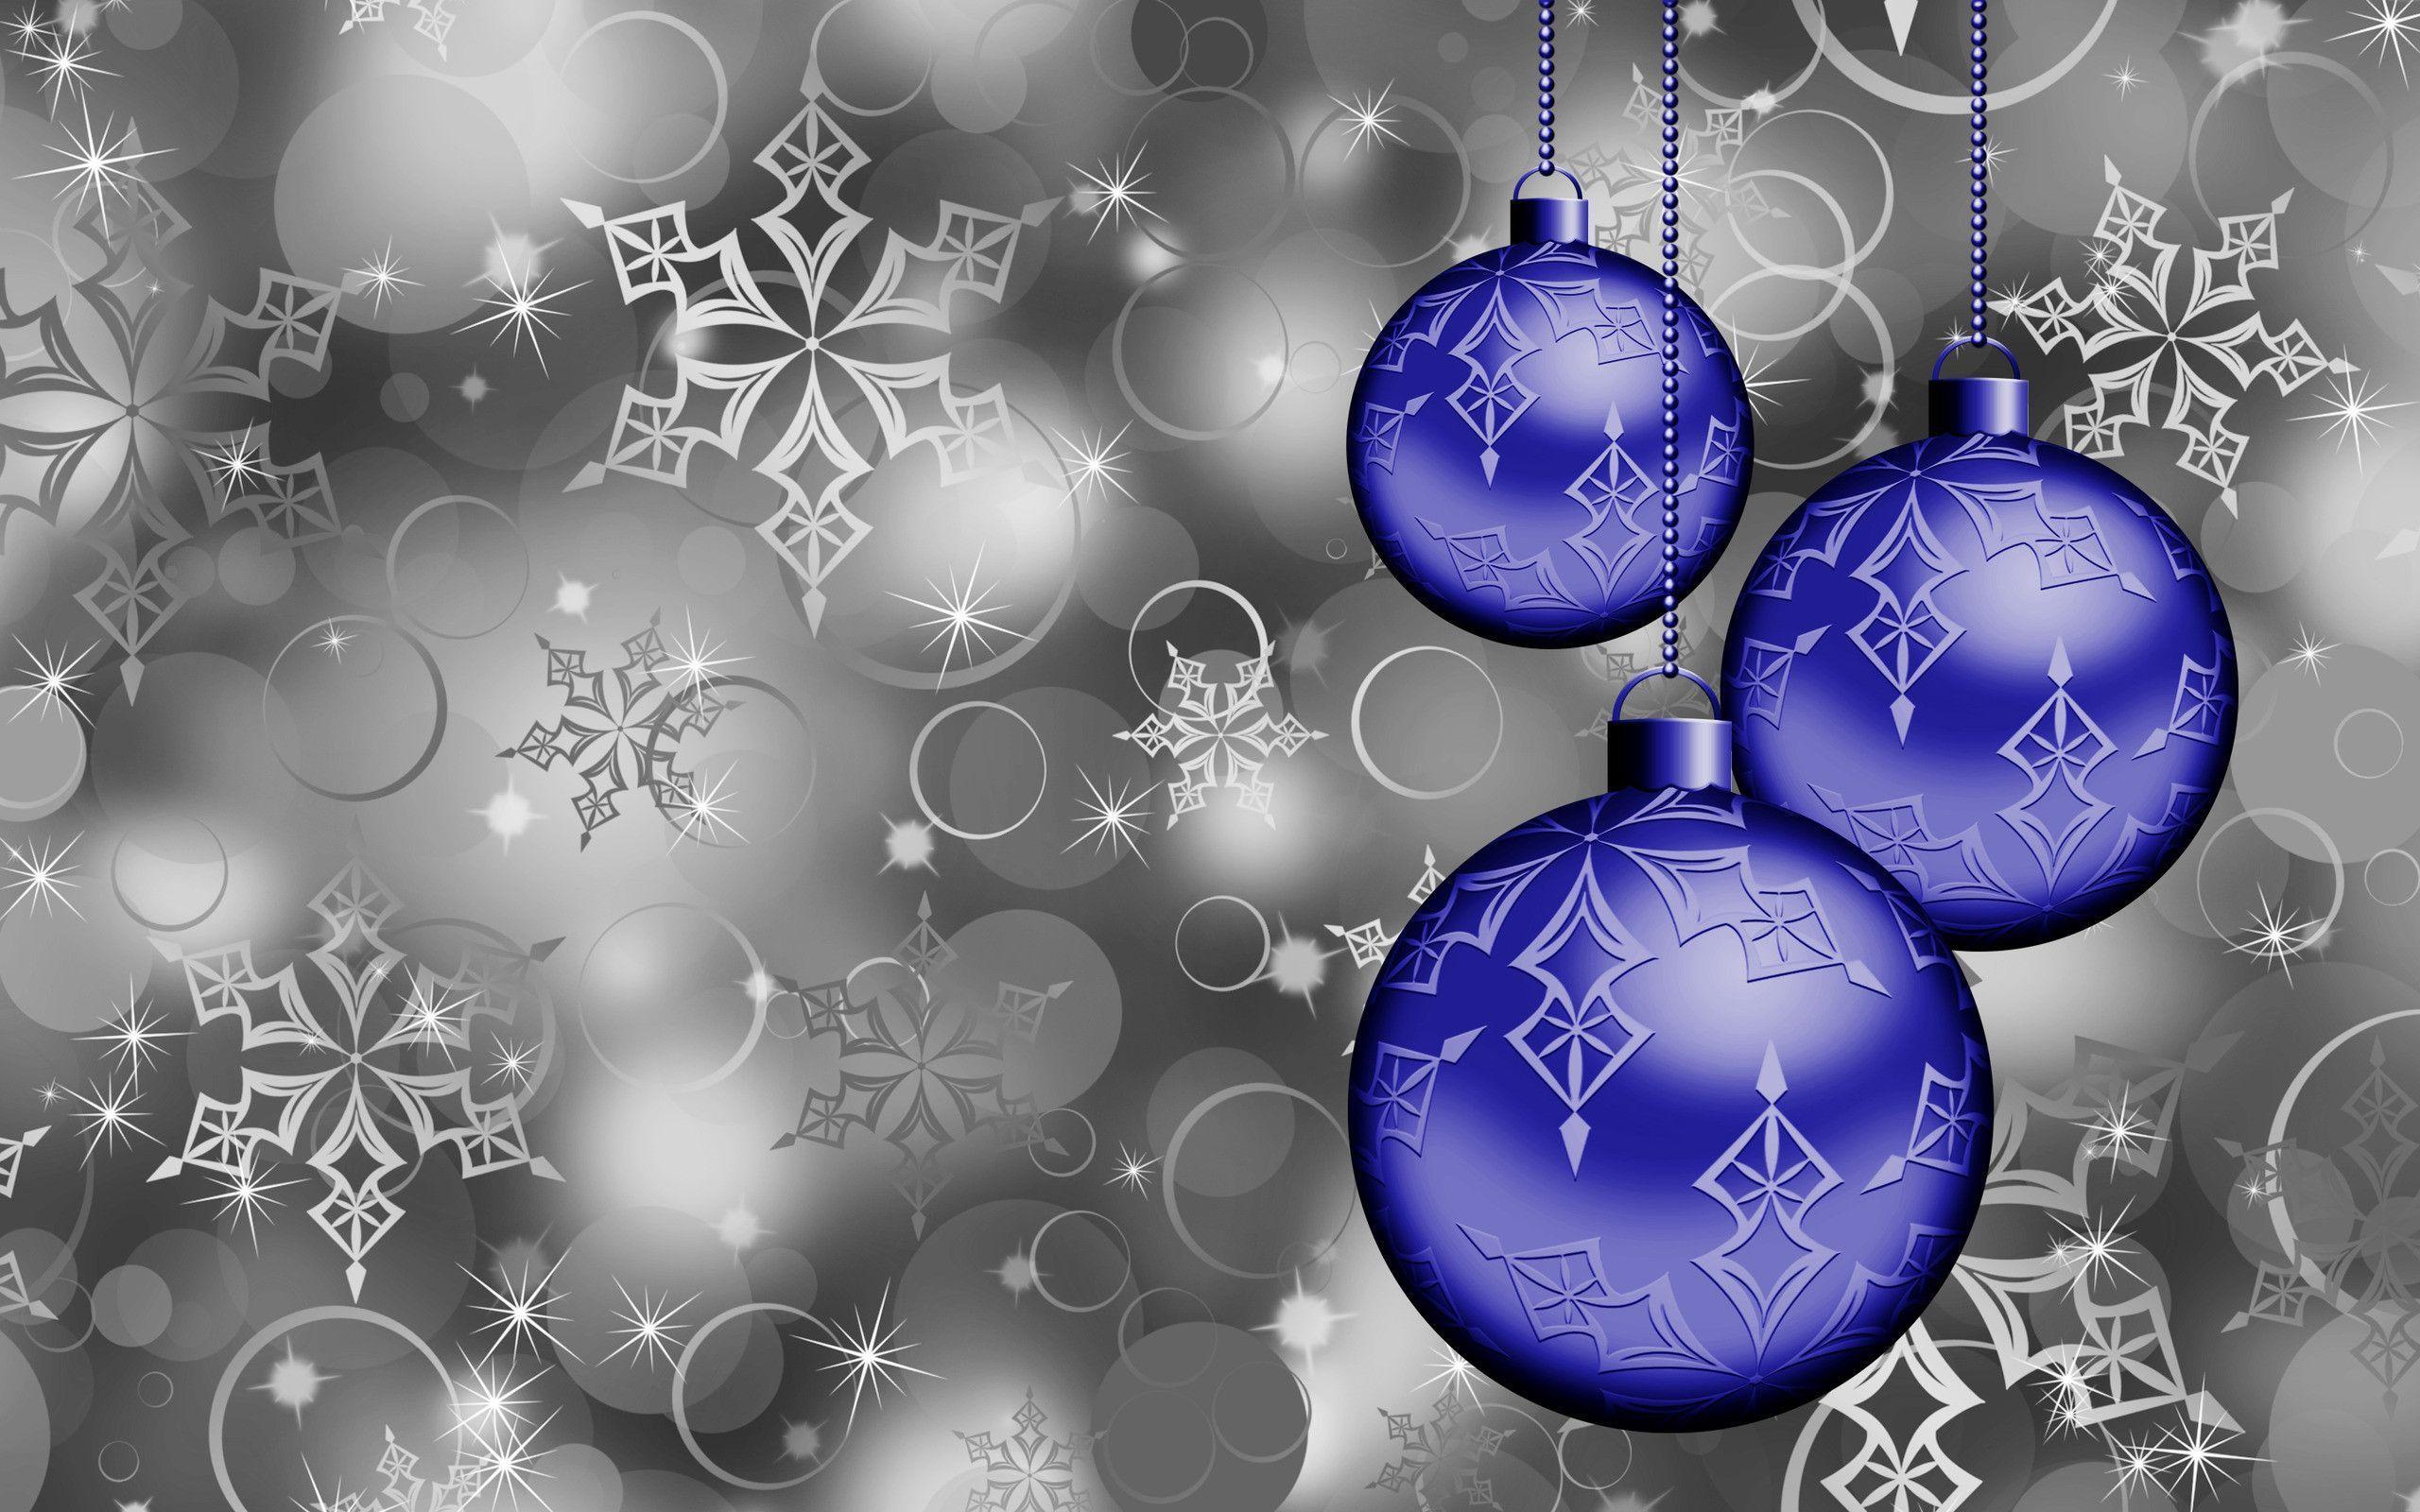 Christmas ornaments wallpaper #